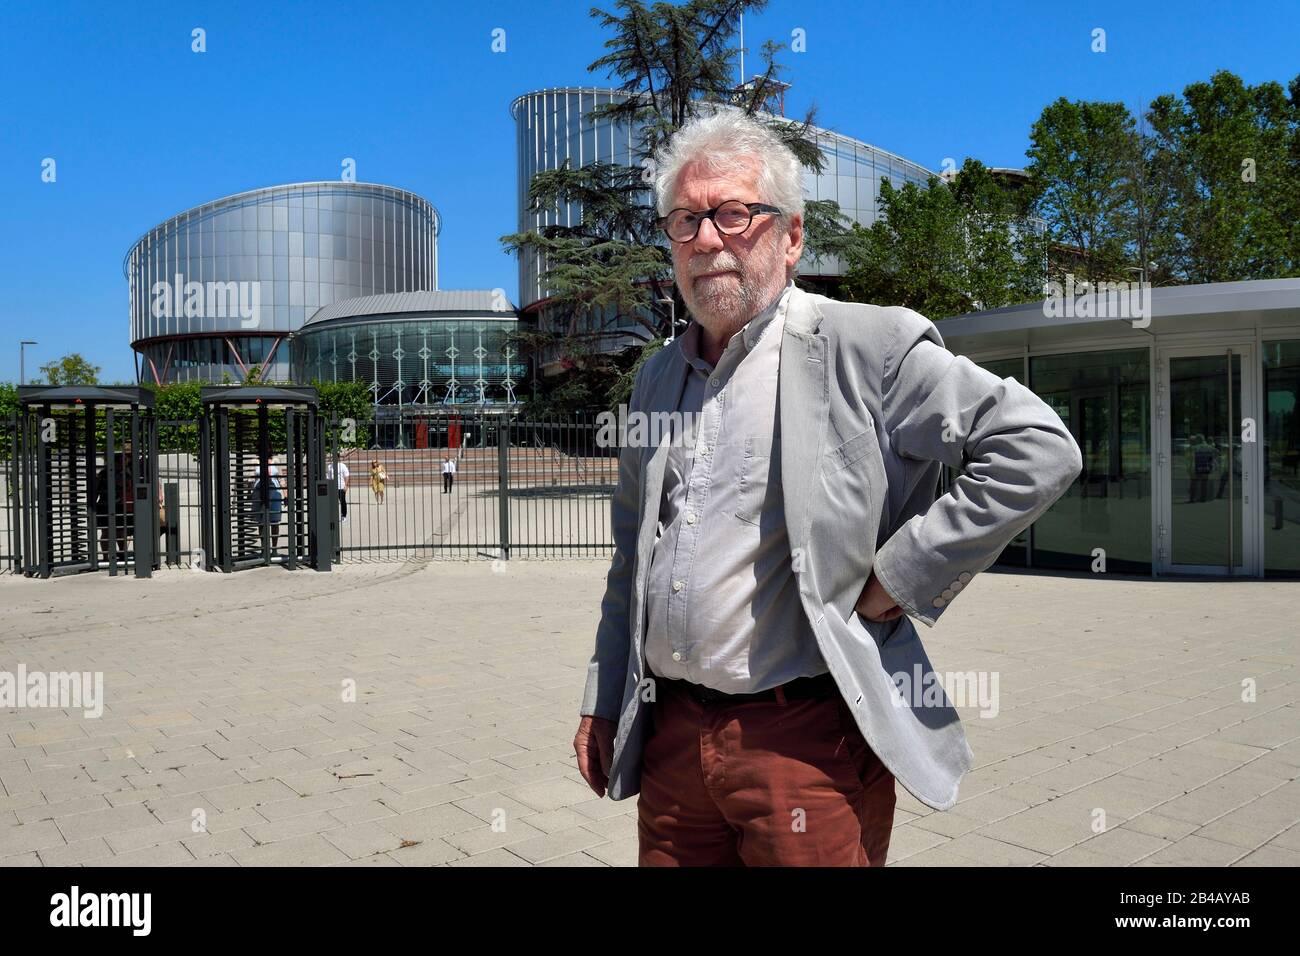 Architecte Bas Rhin france, bas rhin, strasbourg, european district, the